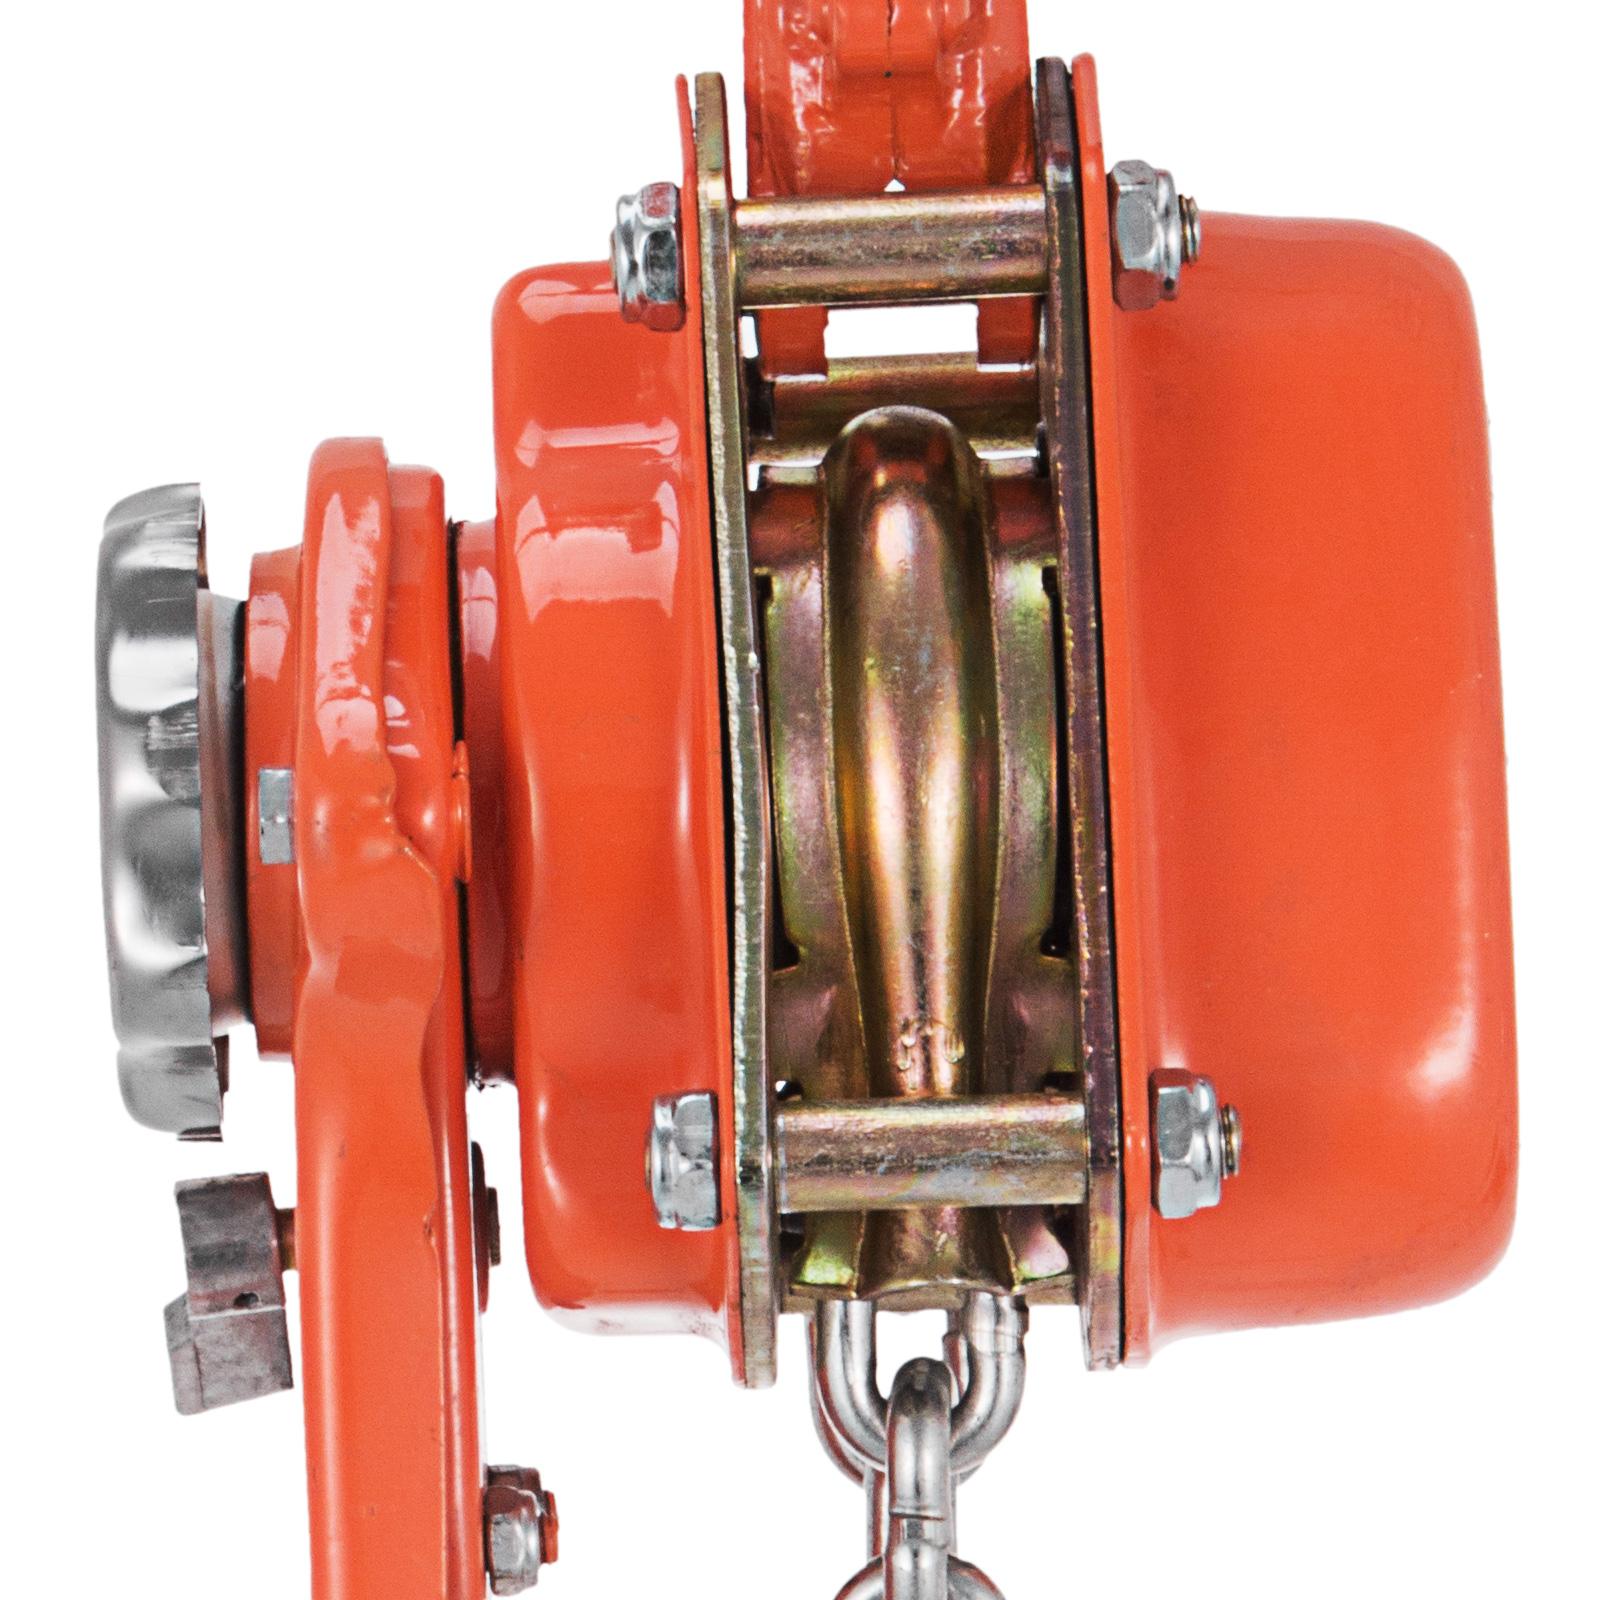 1-5T-Lever-Block-Chain-Hoist-1-5M-6M-Lift-Pull-Machinery-Gear-FACTORY-DISCOUNT thumbnail 20